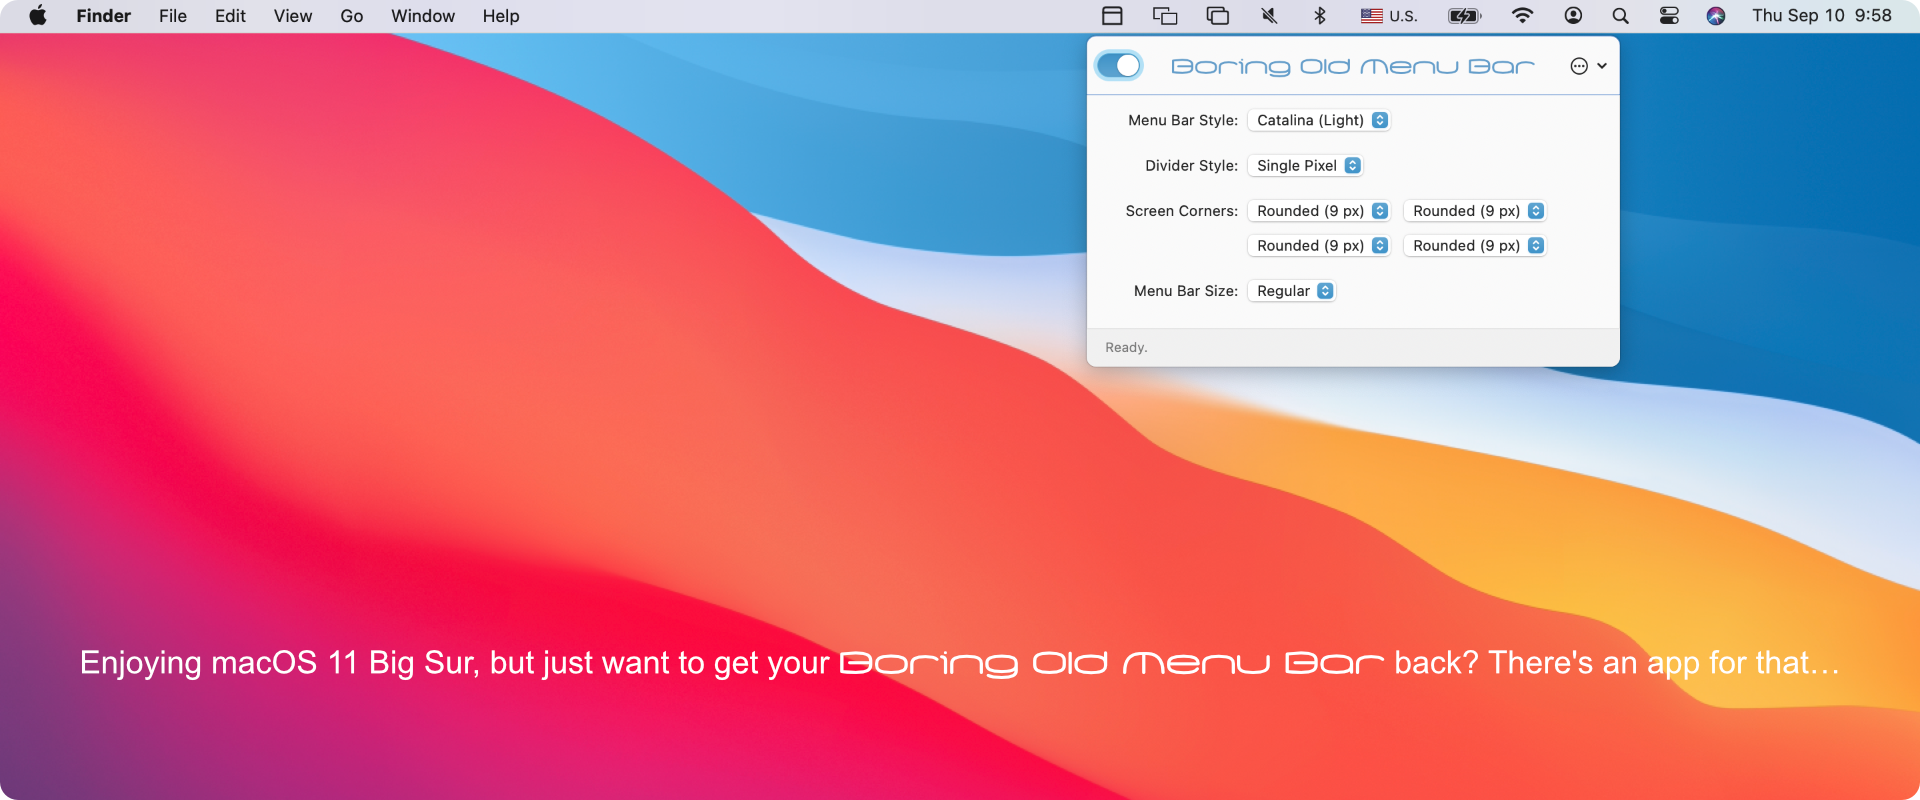 Boring Old Menu Bar 1.17 Mac 破解版 Big Sur菜单栏优化工具